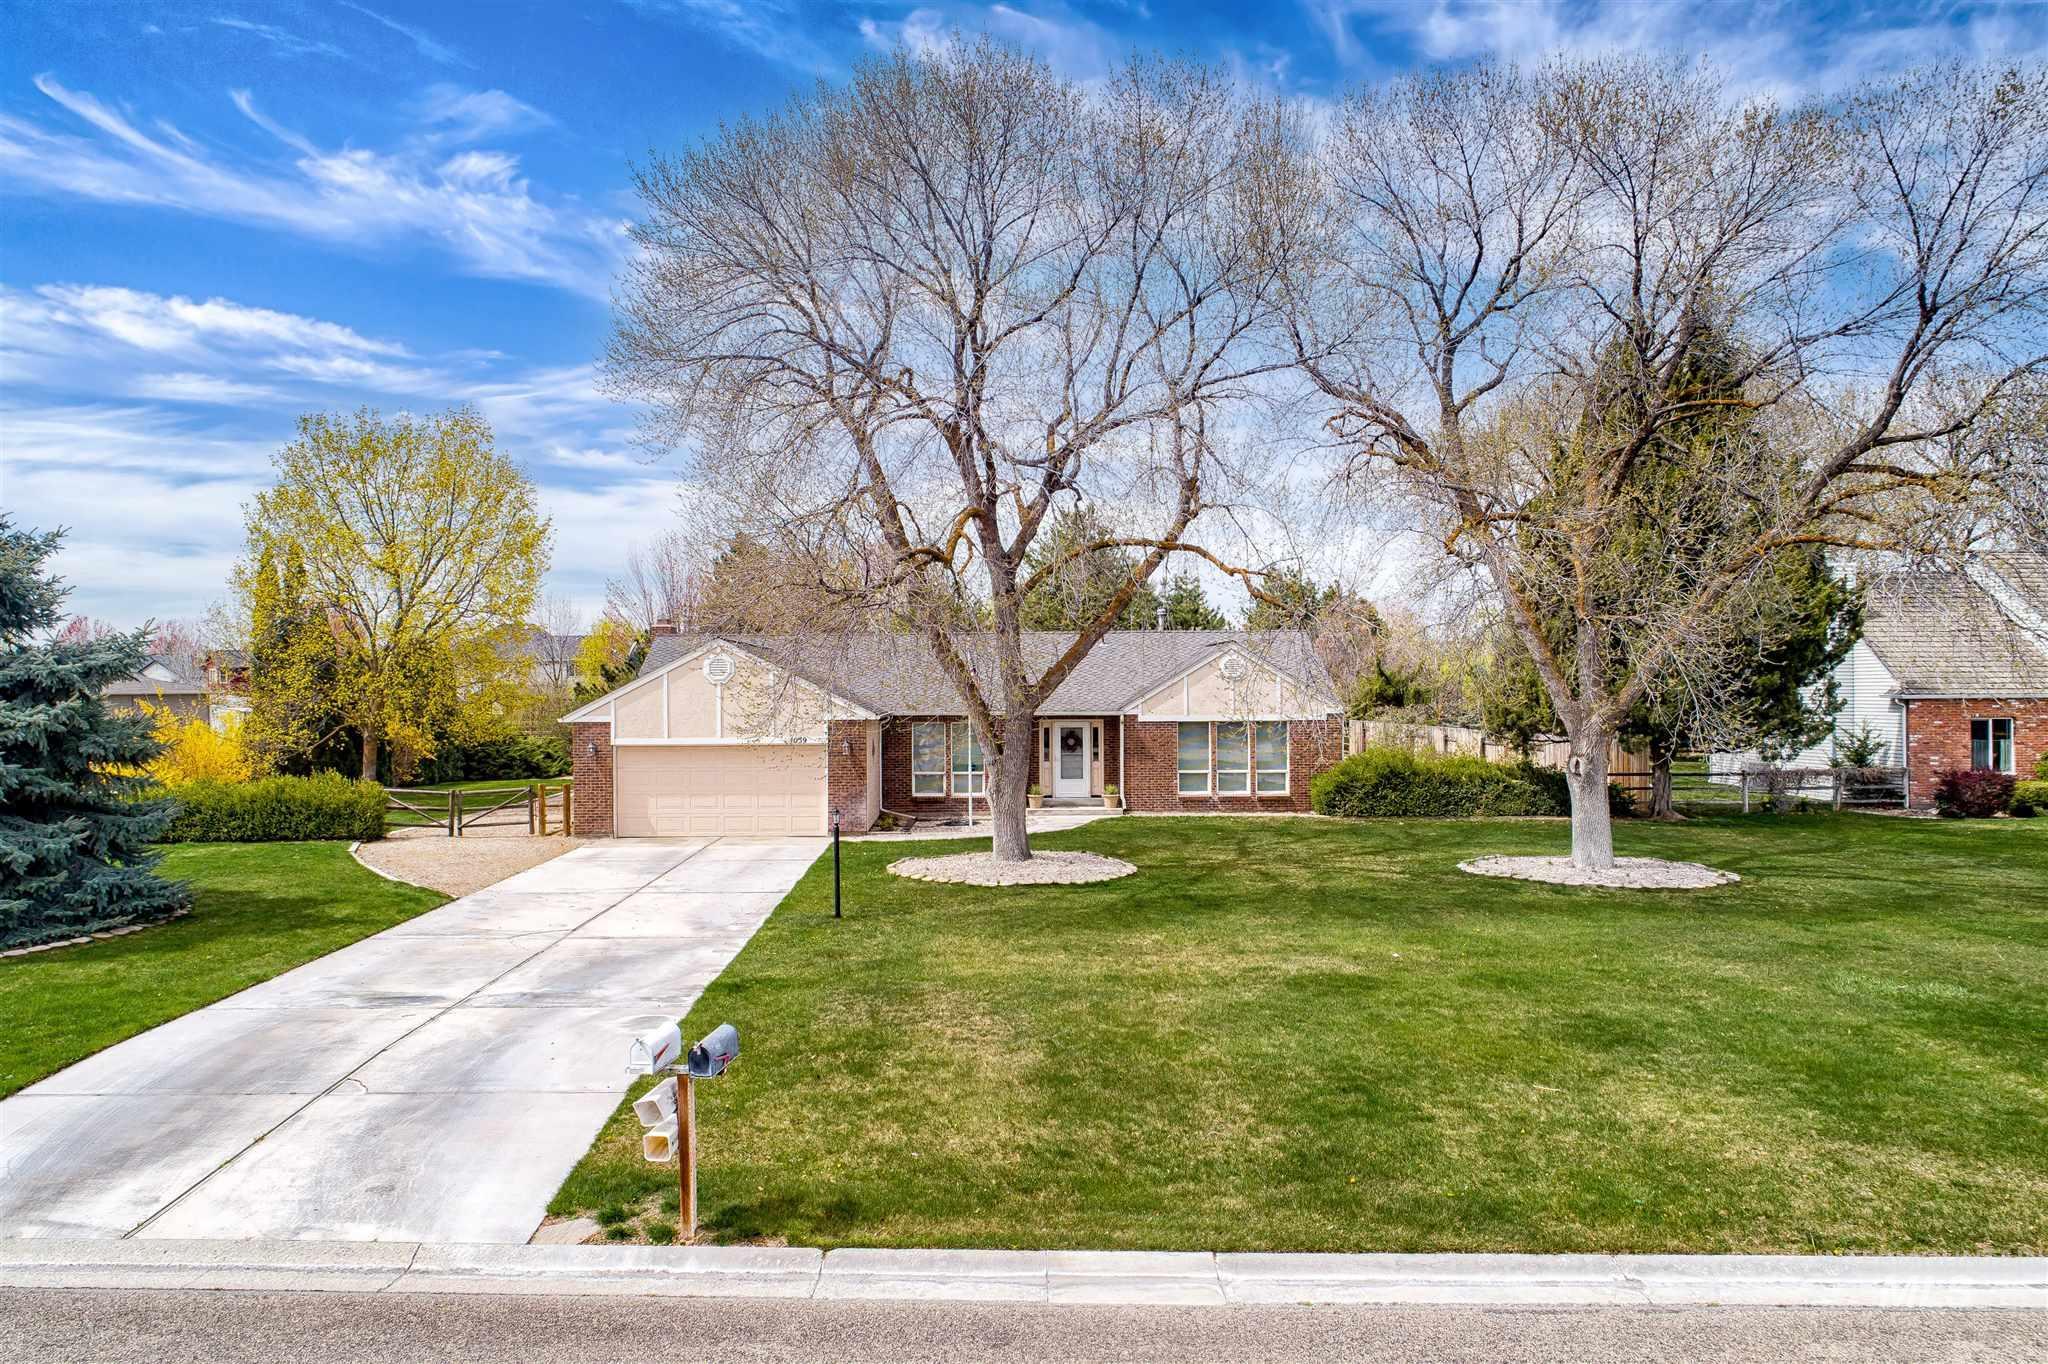 1059 N Justin Pl Property Photo - Meridian, ID real estate listing